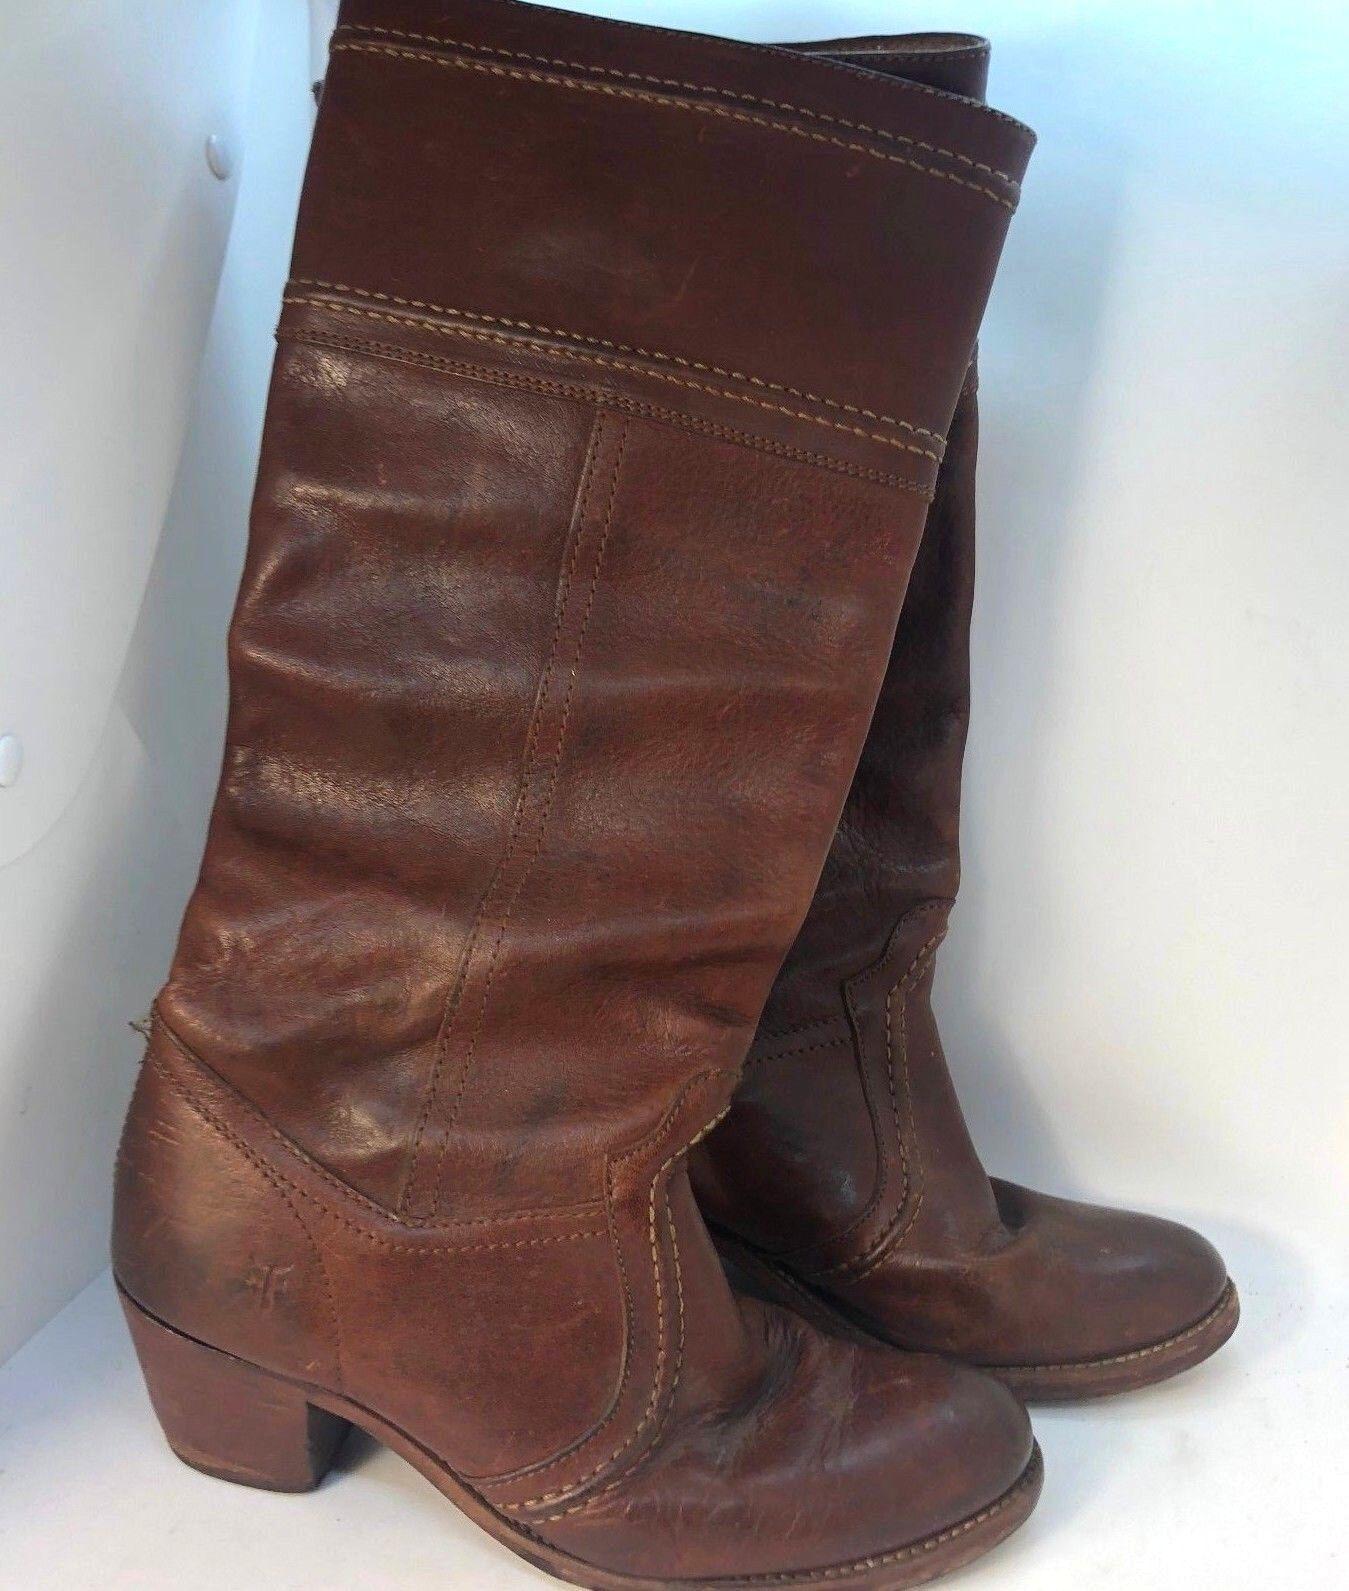 Frye Carmen Harness Tall Boots Extended Sz 7 Womens  348